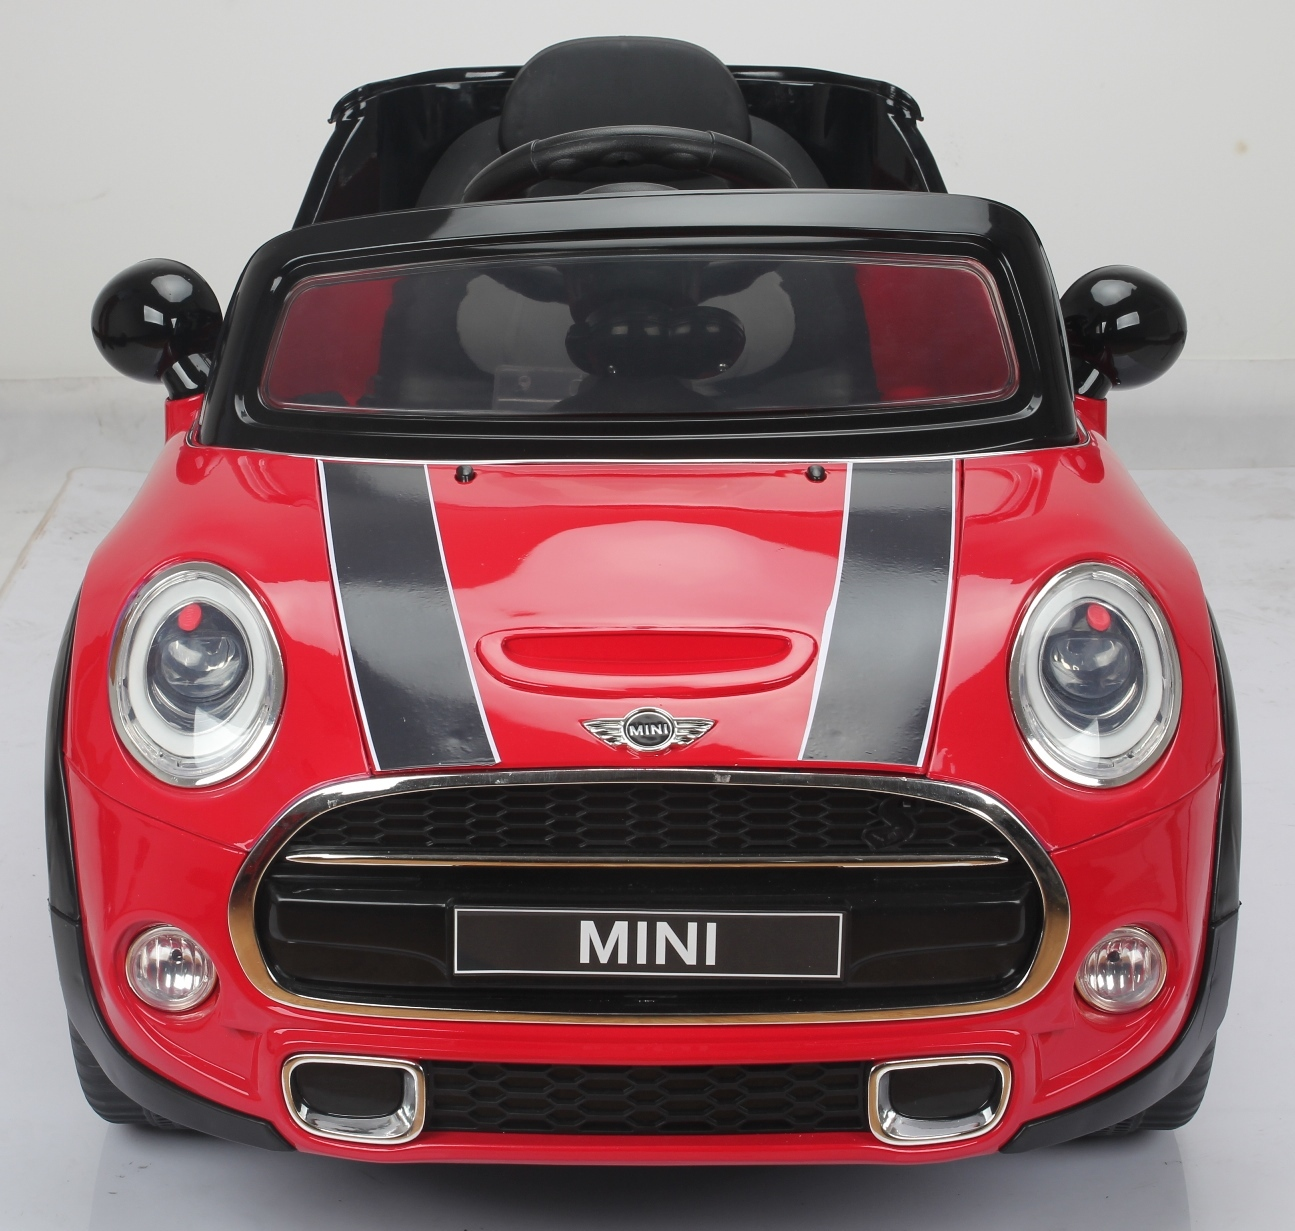 12v mini cooper s kinder elektro auto rot kinderauto online shop. Black Bedroom Furniture Sets. Home Design Ideas